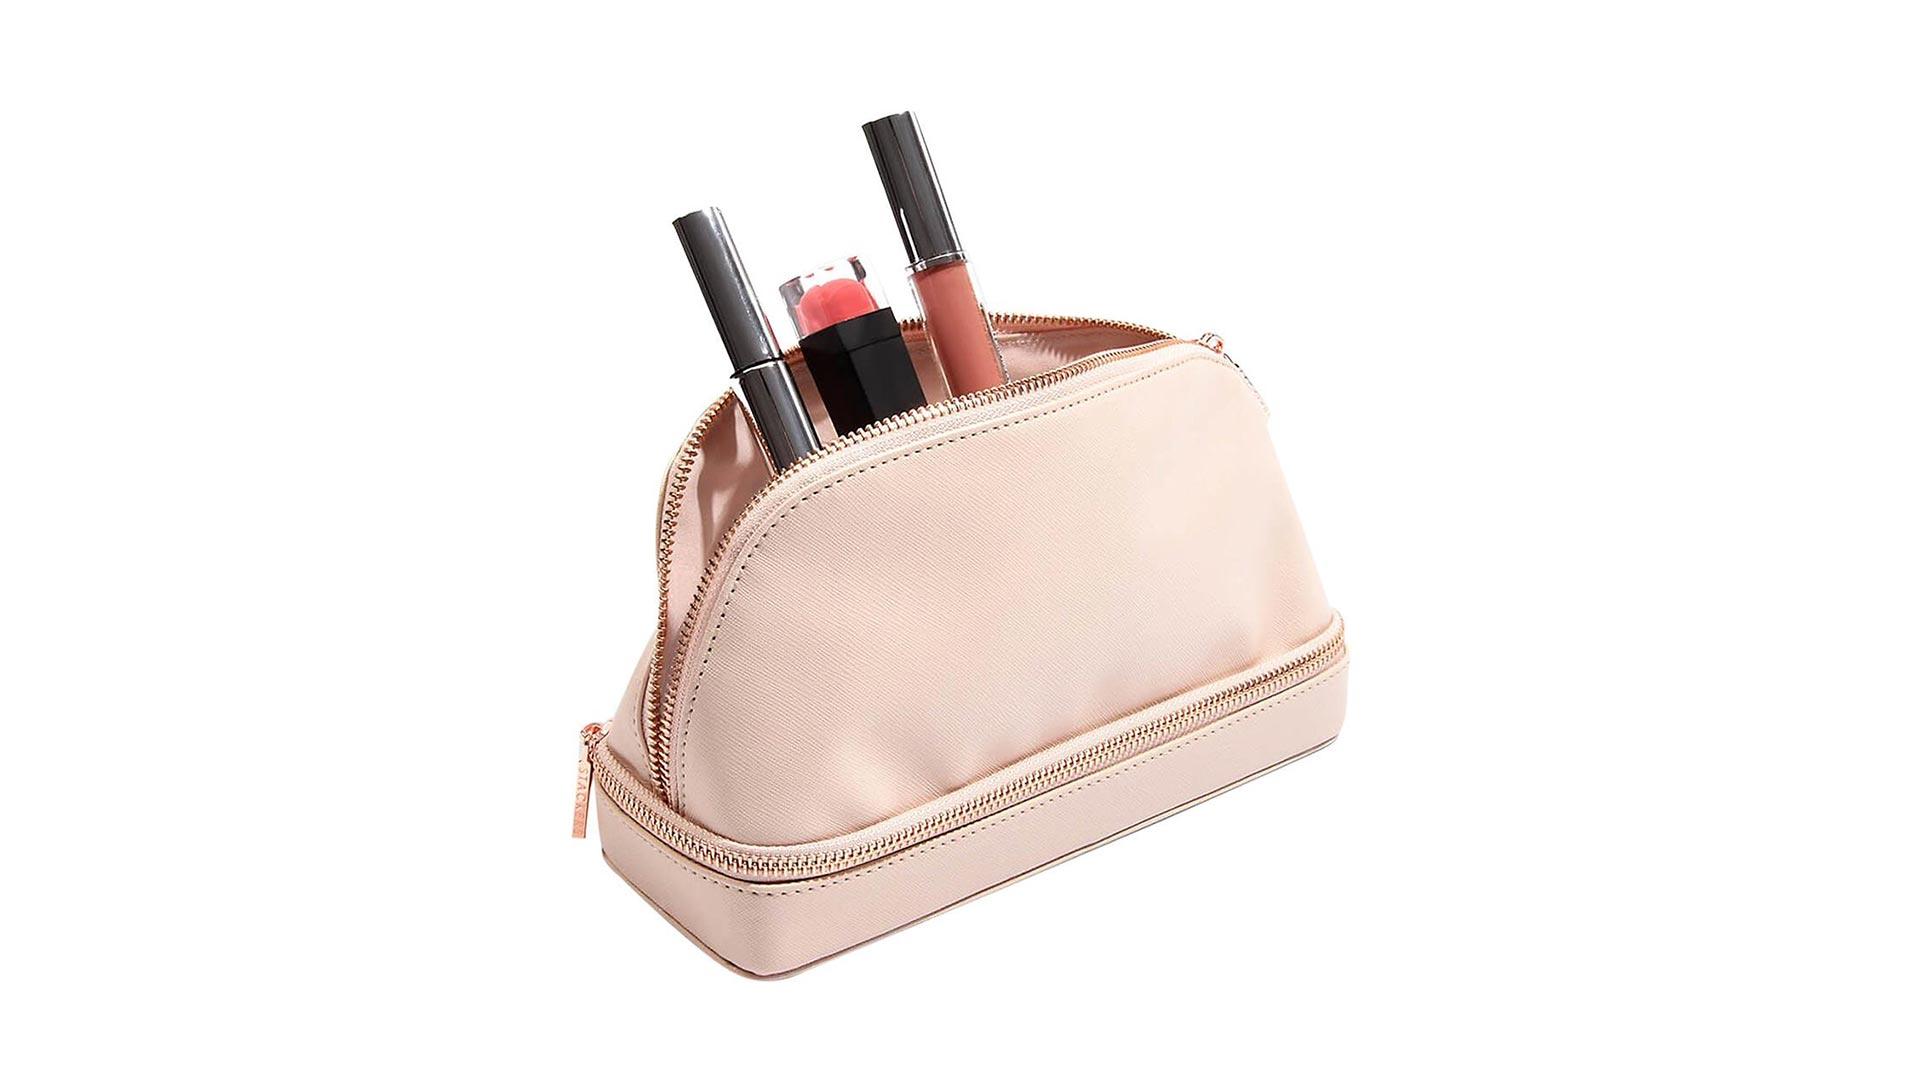 Makeup Travel Case